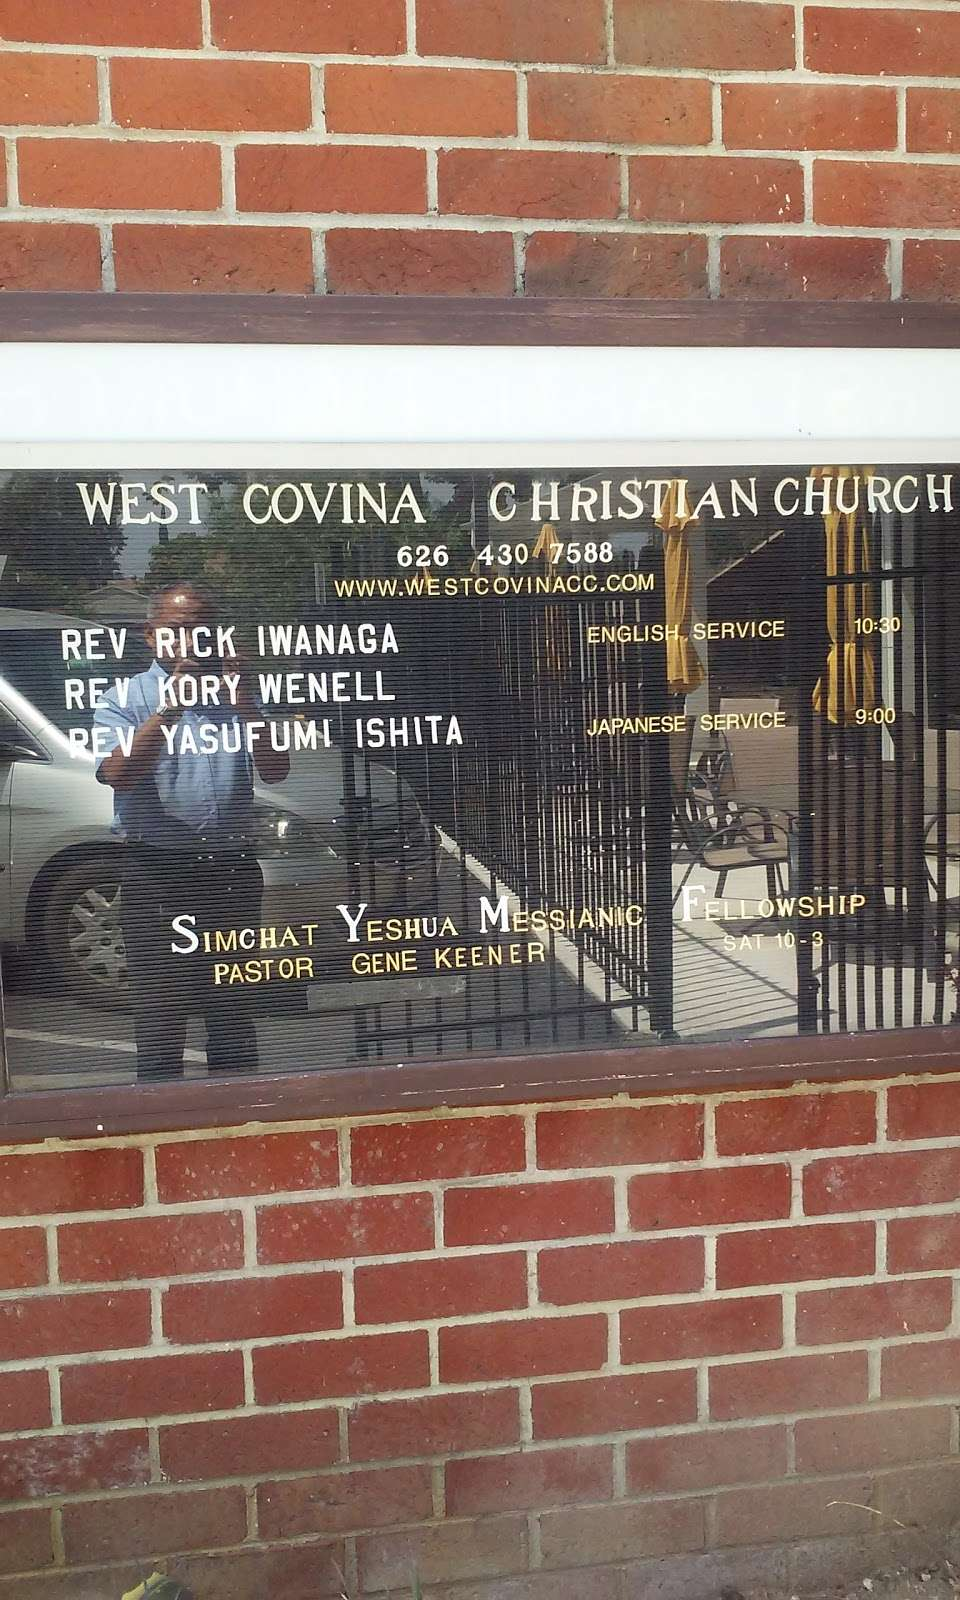 Simchat Yeshua Messianic Fellowship - Synagogue | 1100 E Cameron Ave